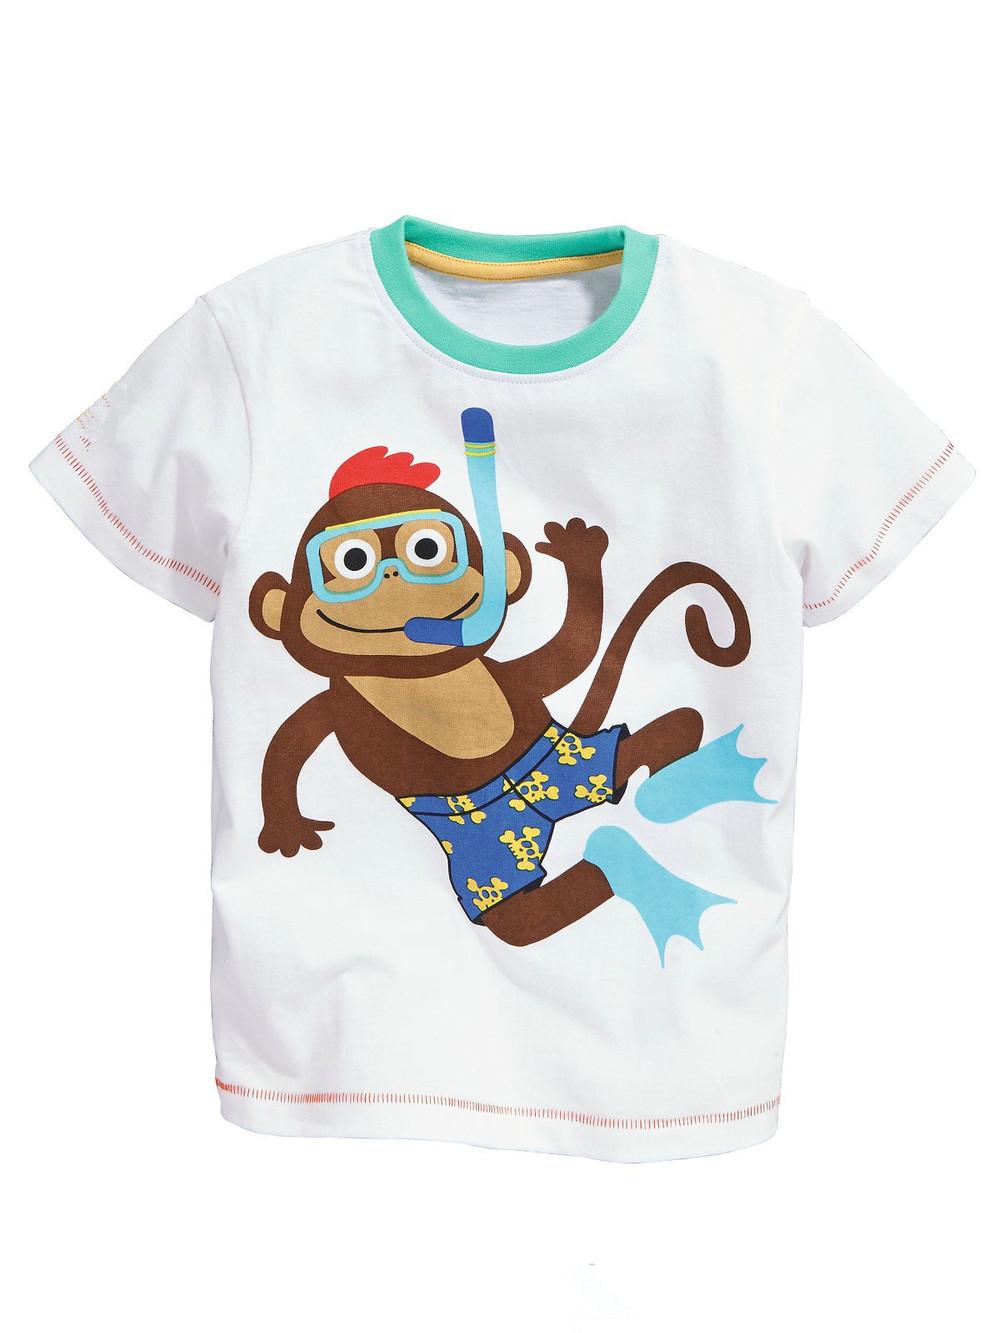 HTB1WwDBHXXXXXbpXFXXq6xXFXXXh - brand 2018 new fashion kids clothing 100%cotton blouse childrens clothes baby boy t shirts boy's top tee cartoon car Dinosaur